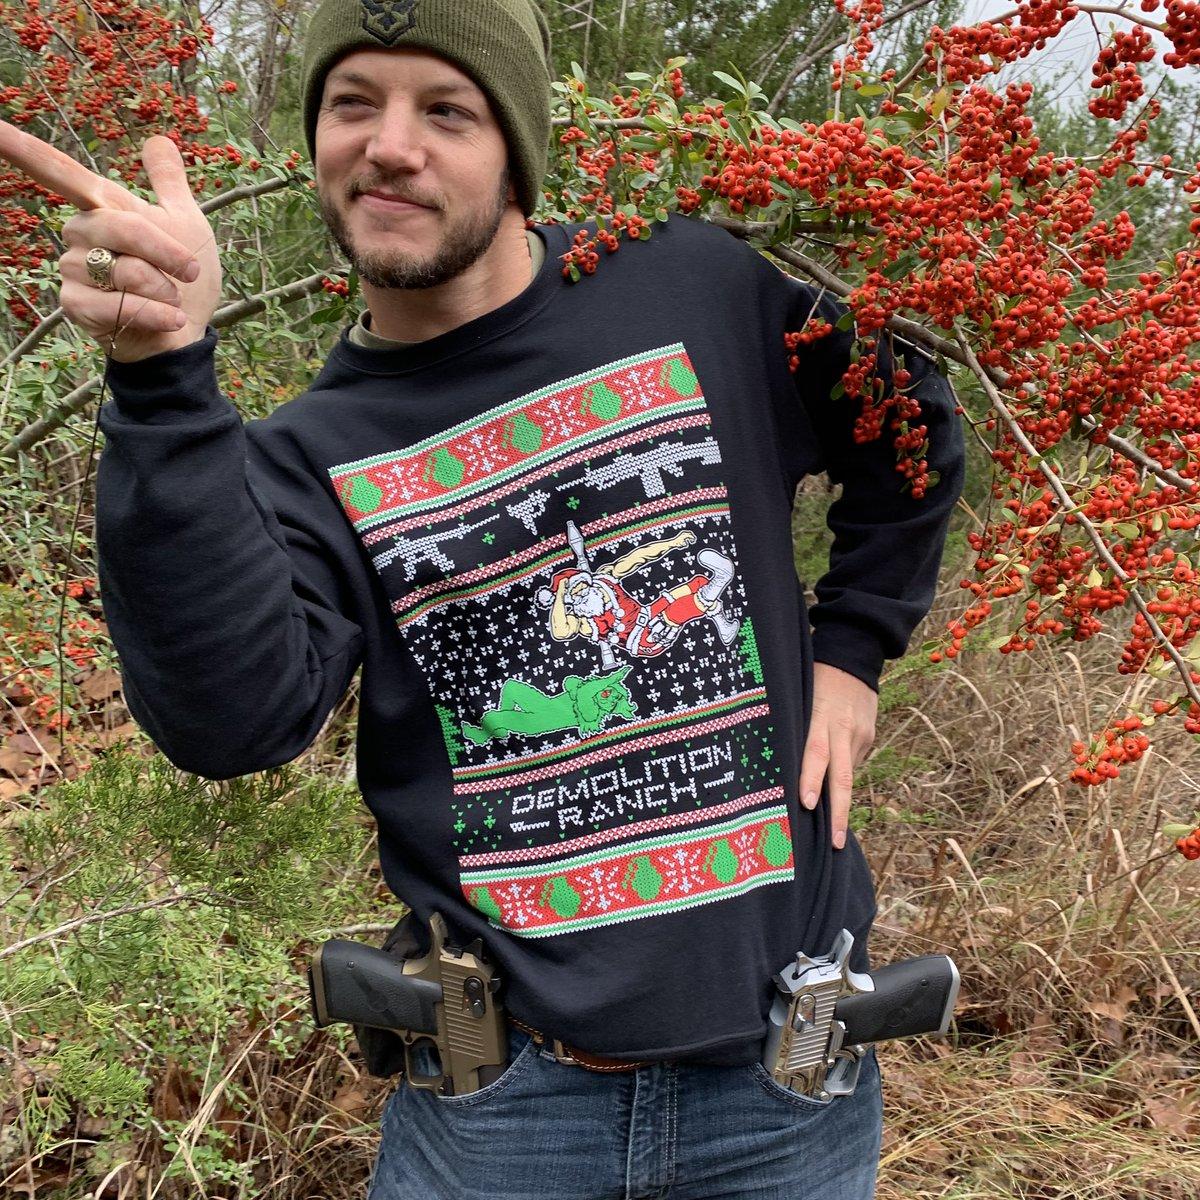 Drmattcarriker On Twitter Im The Definition Of Christmas Spirit